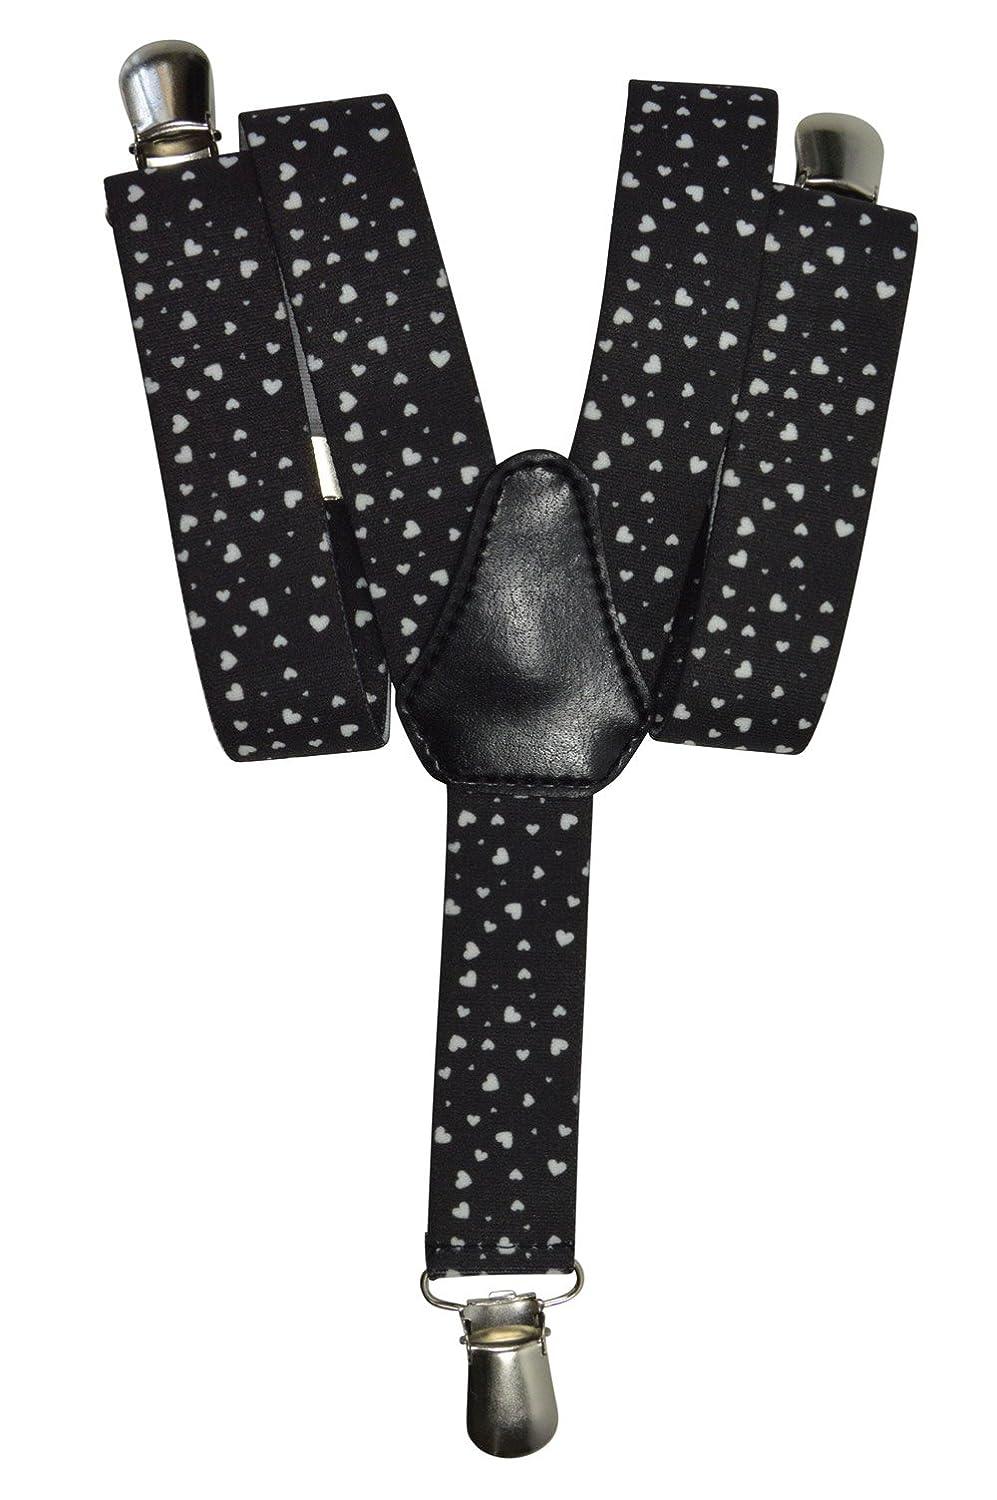 Olata Bretelle Elasticizzata per Bambini 1-5 Anni, Y' Clip design, Cuore Modello Y' Clip design Cuore Modello - Blu KIDSBRACESJhearts-blue